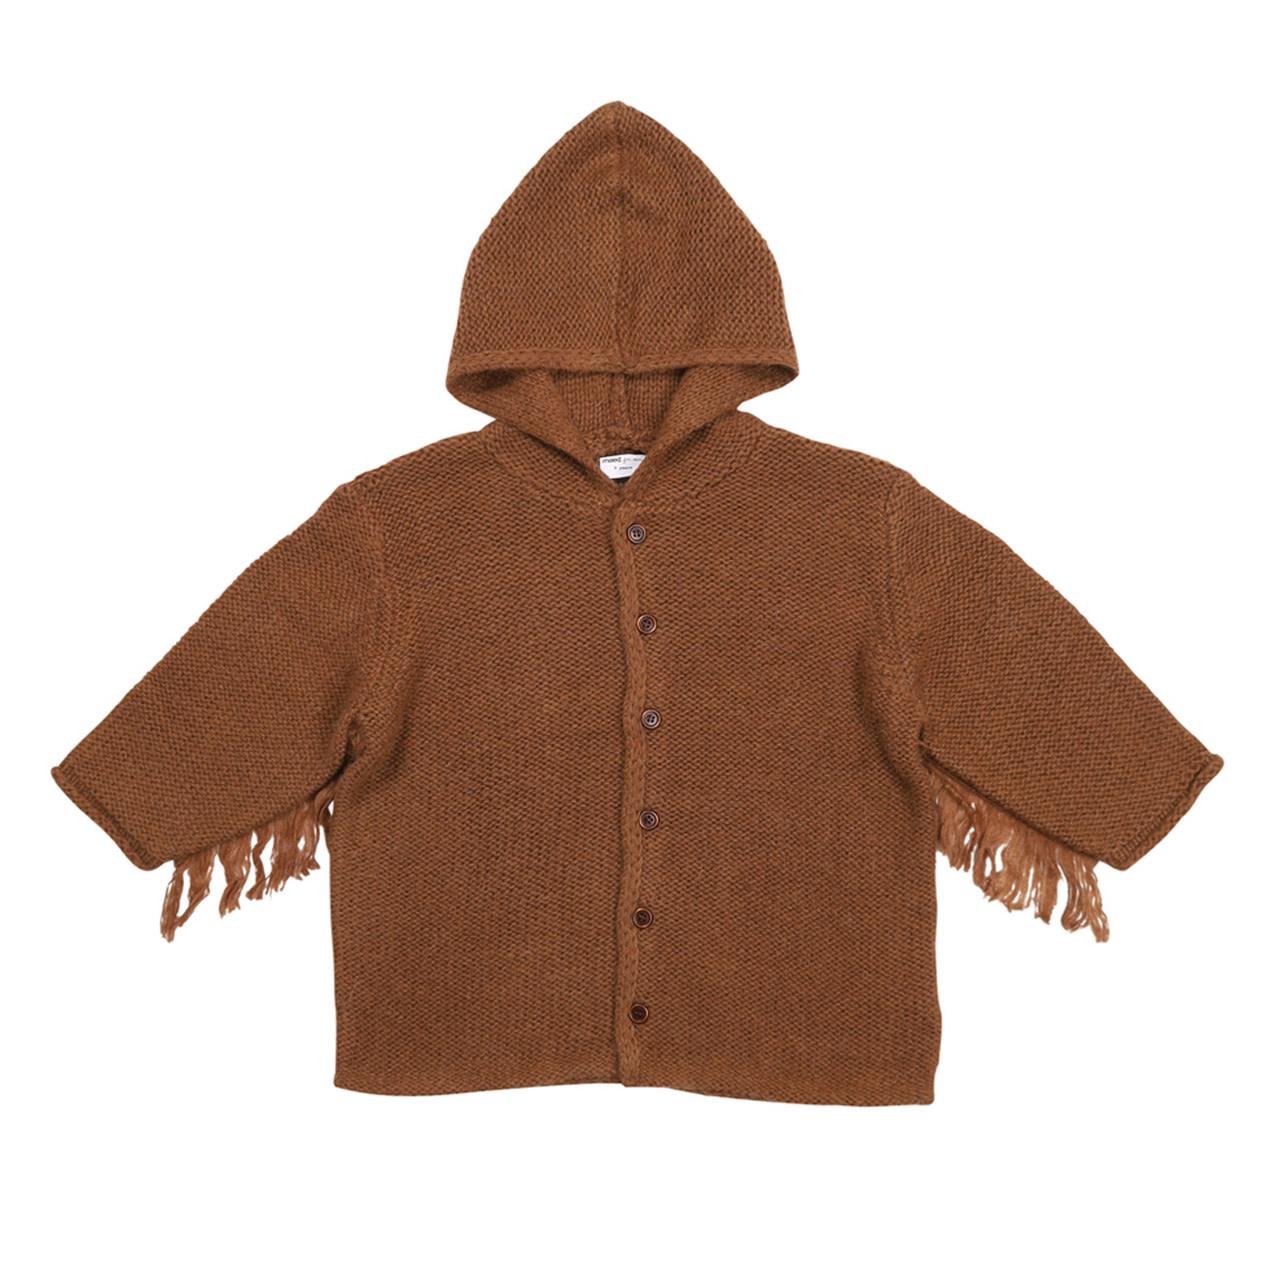 Maed For mini Maed for mini - knit cardigan keen kangaroo